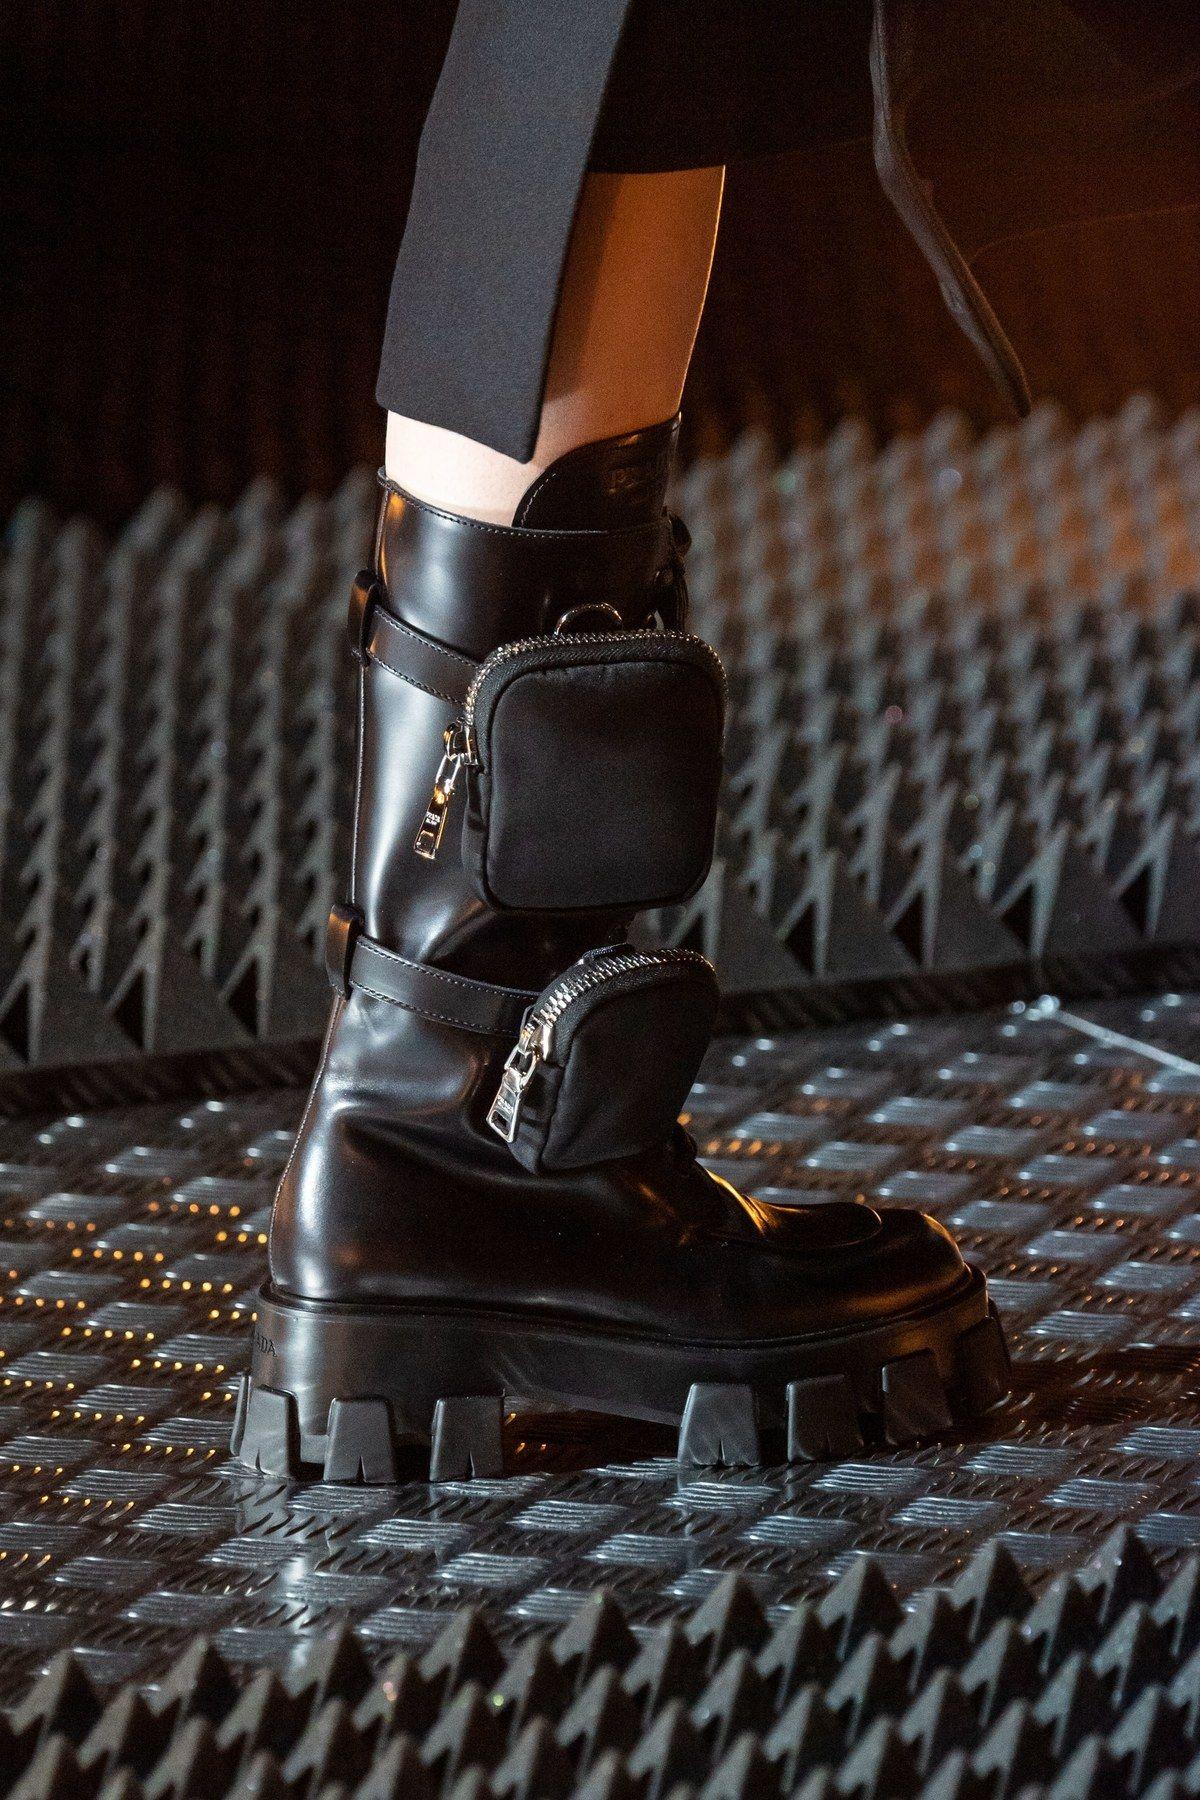 Vogue Germany | Boots, Prada